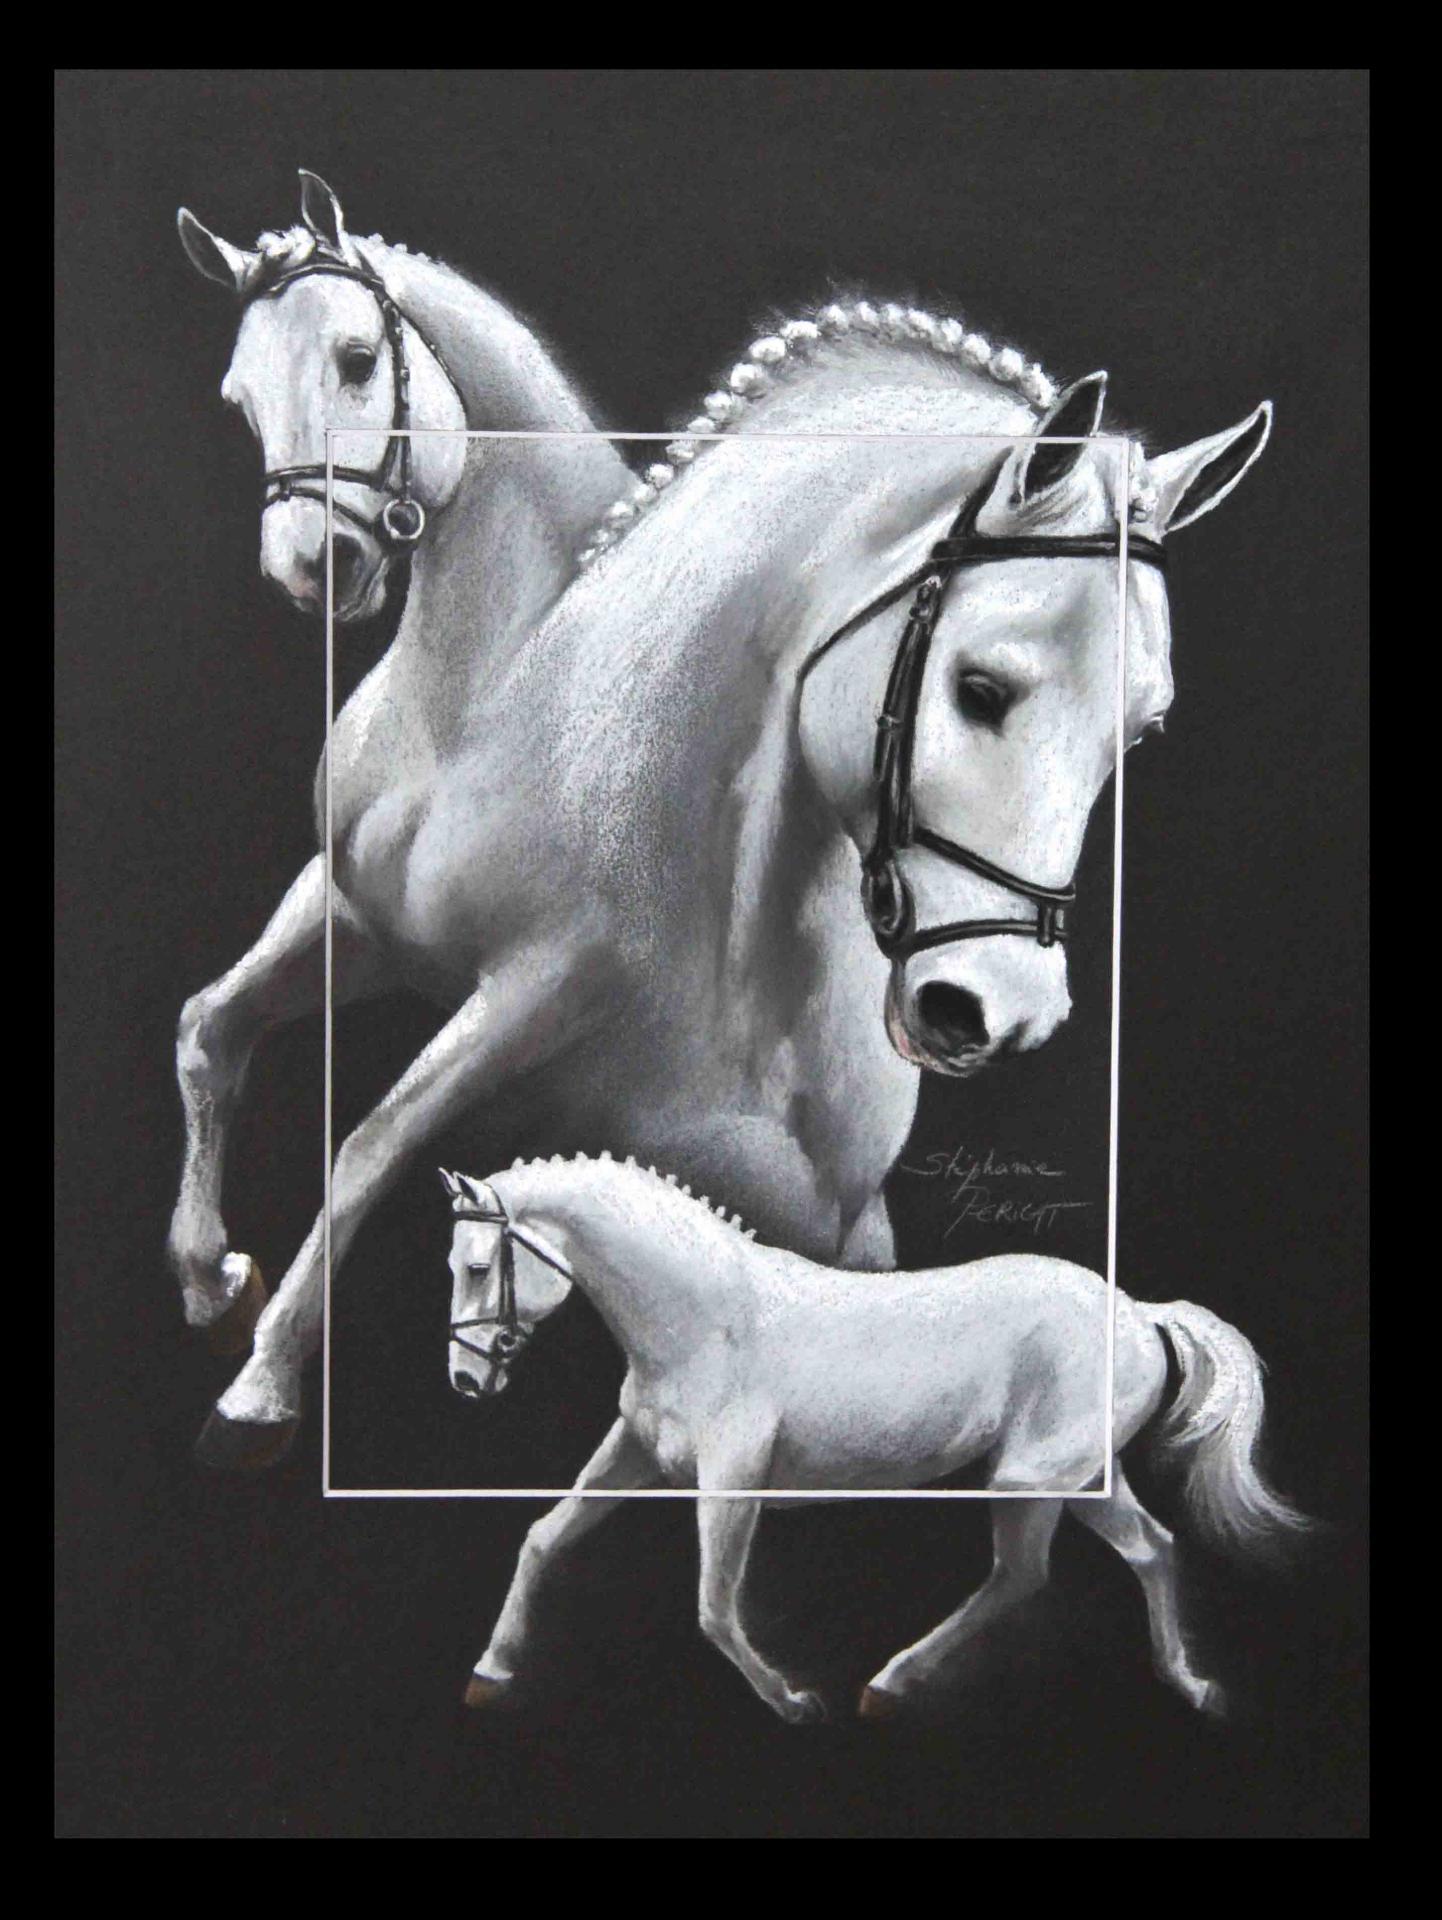 PRESIDENT, ETALON PRIVE (stallion private) - pastel sec (soft pastel) - 30x40cm